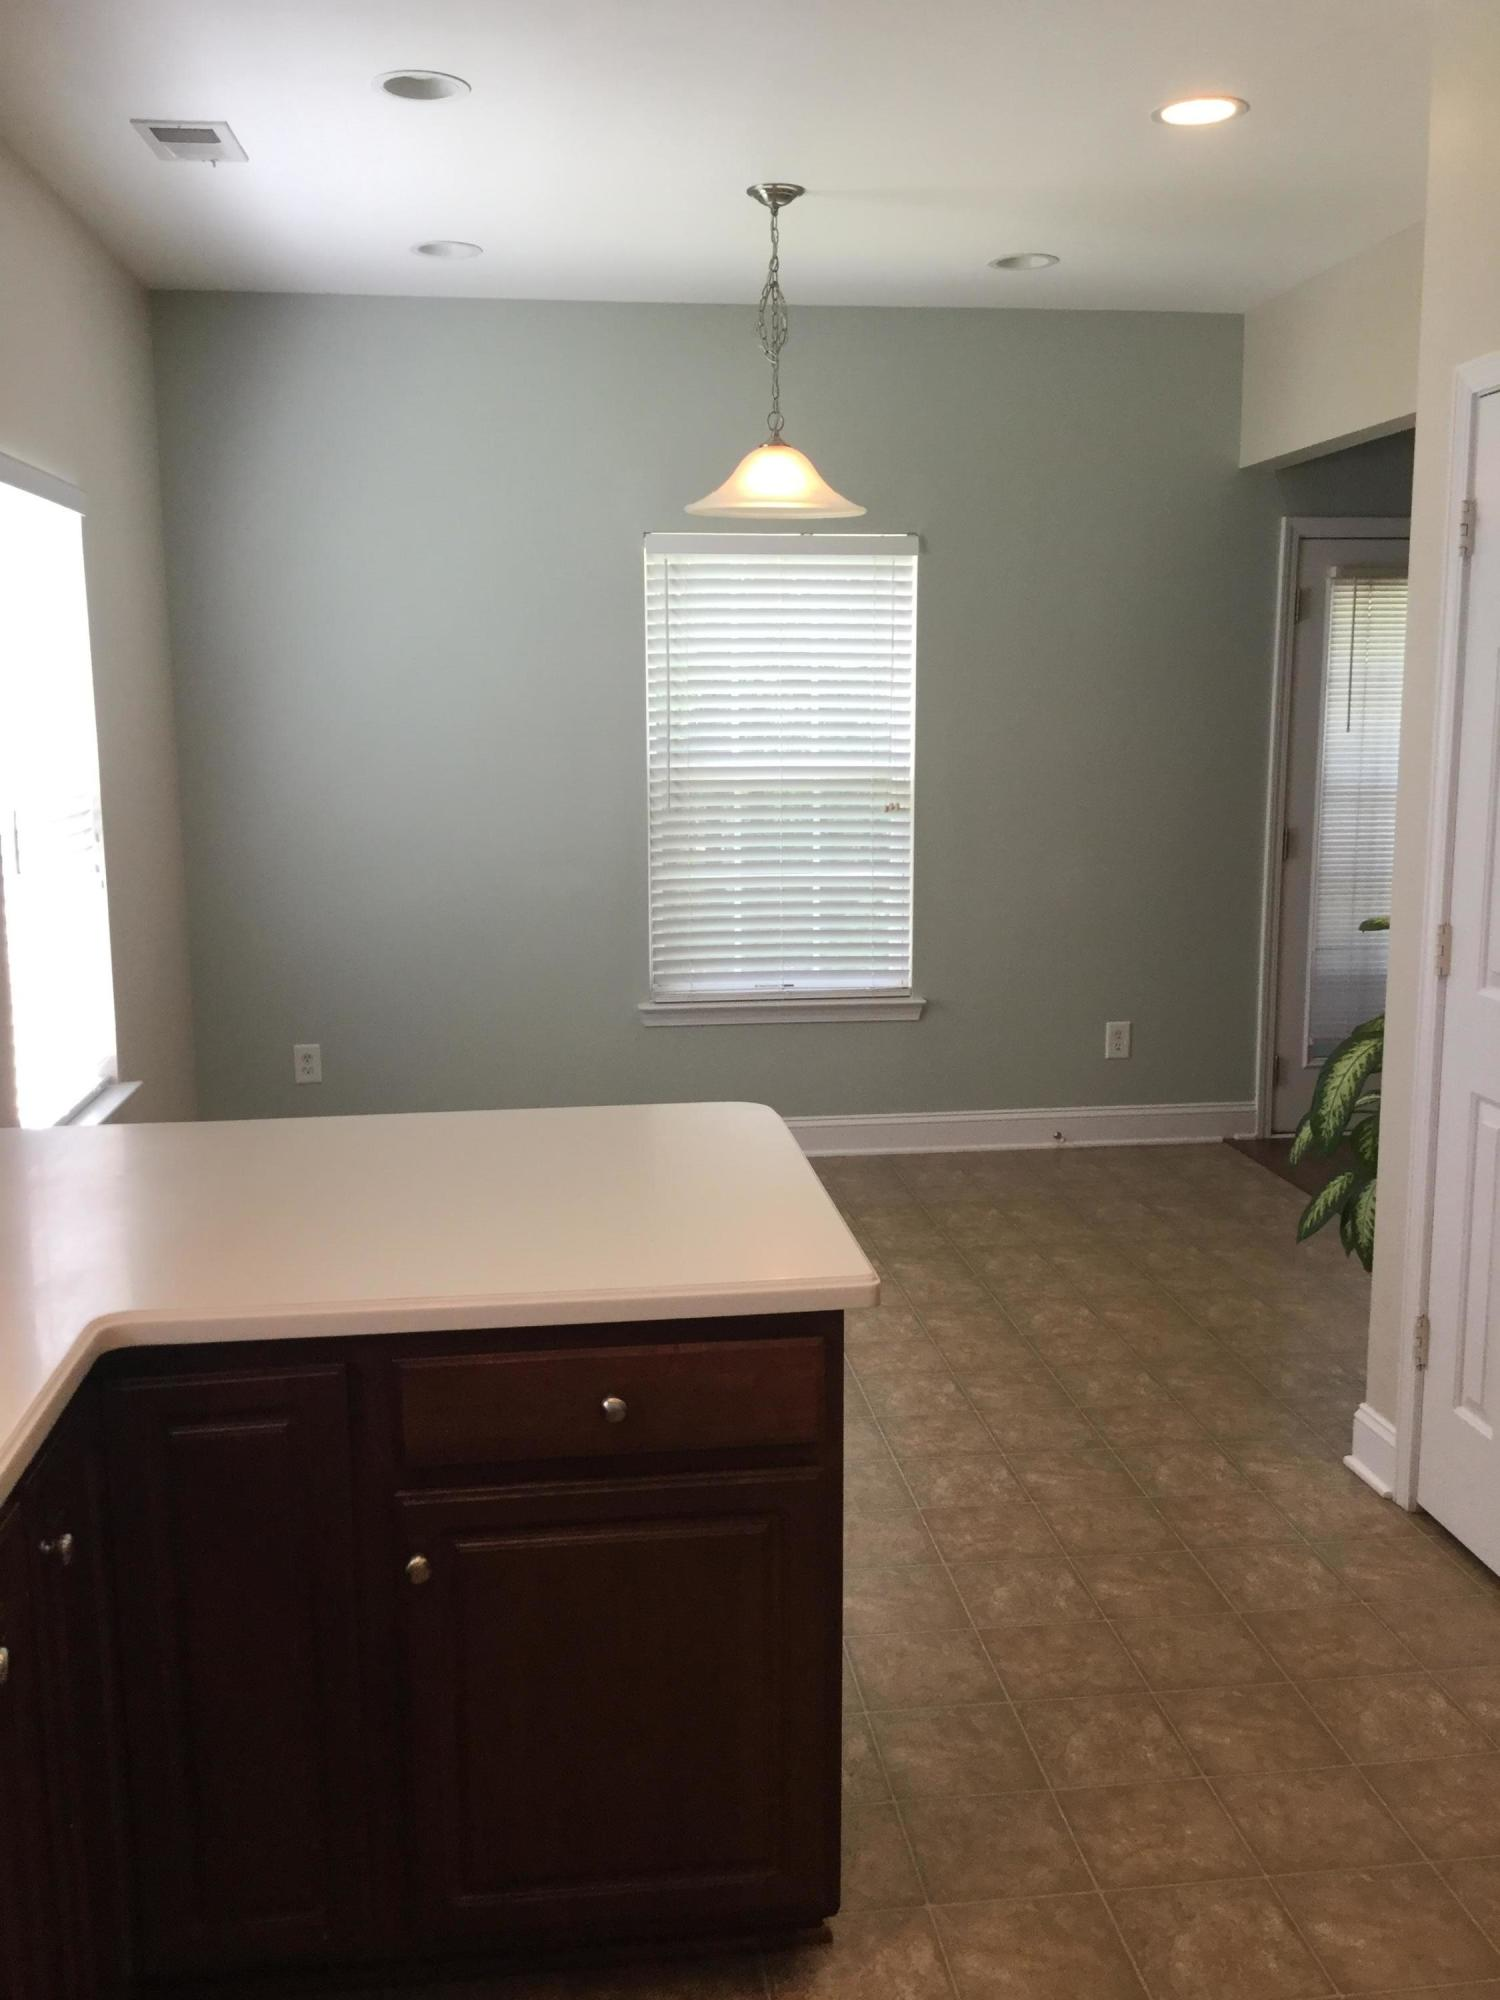 Kennsington Homes For Sale - 122 Heatherlock, Hanahan, SC - 13